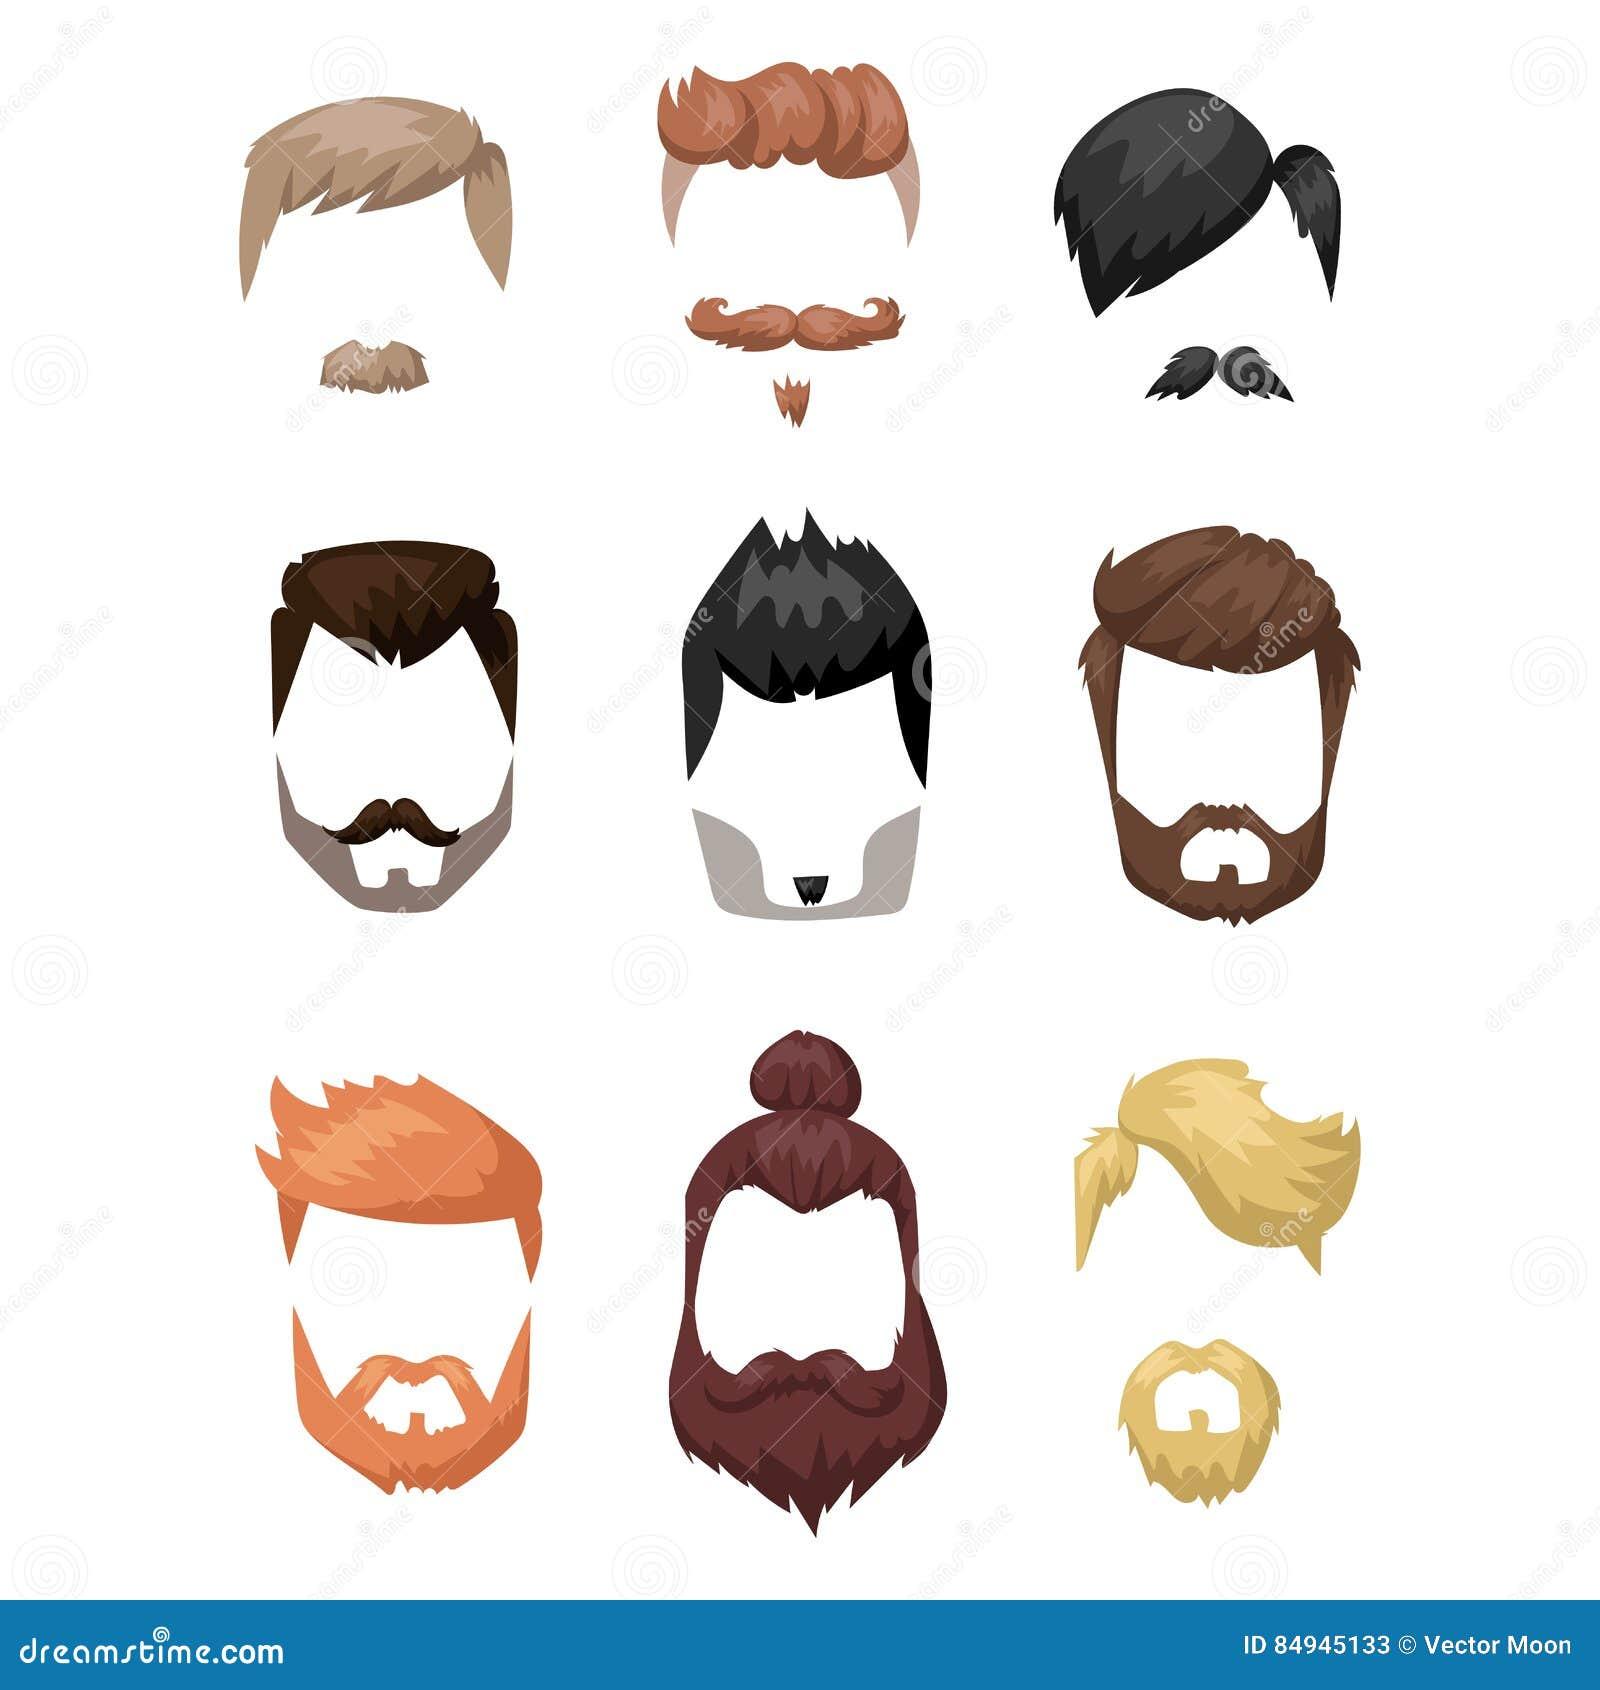 Hairstyle beard and hair face cut mask flat cartoon vector.